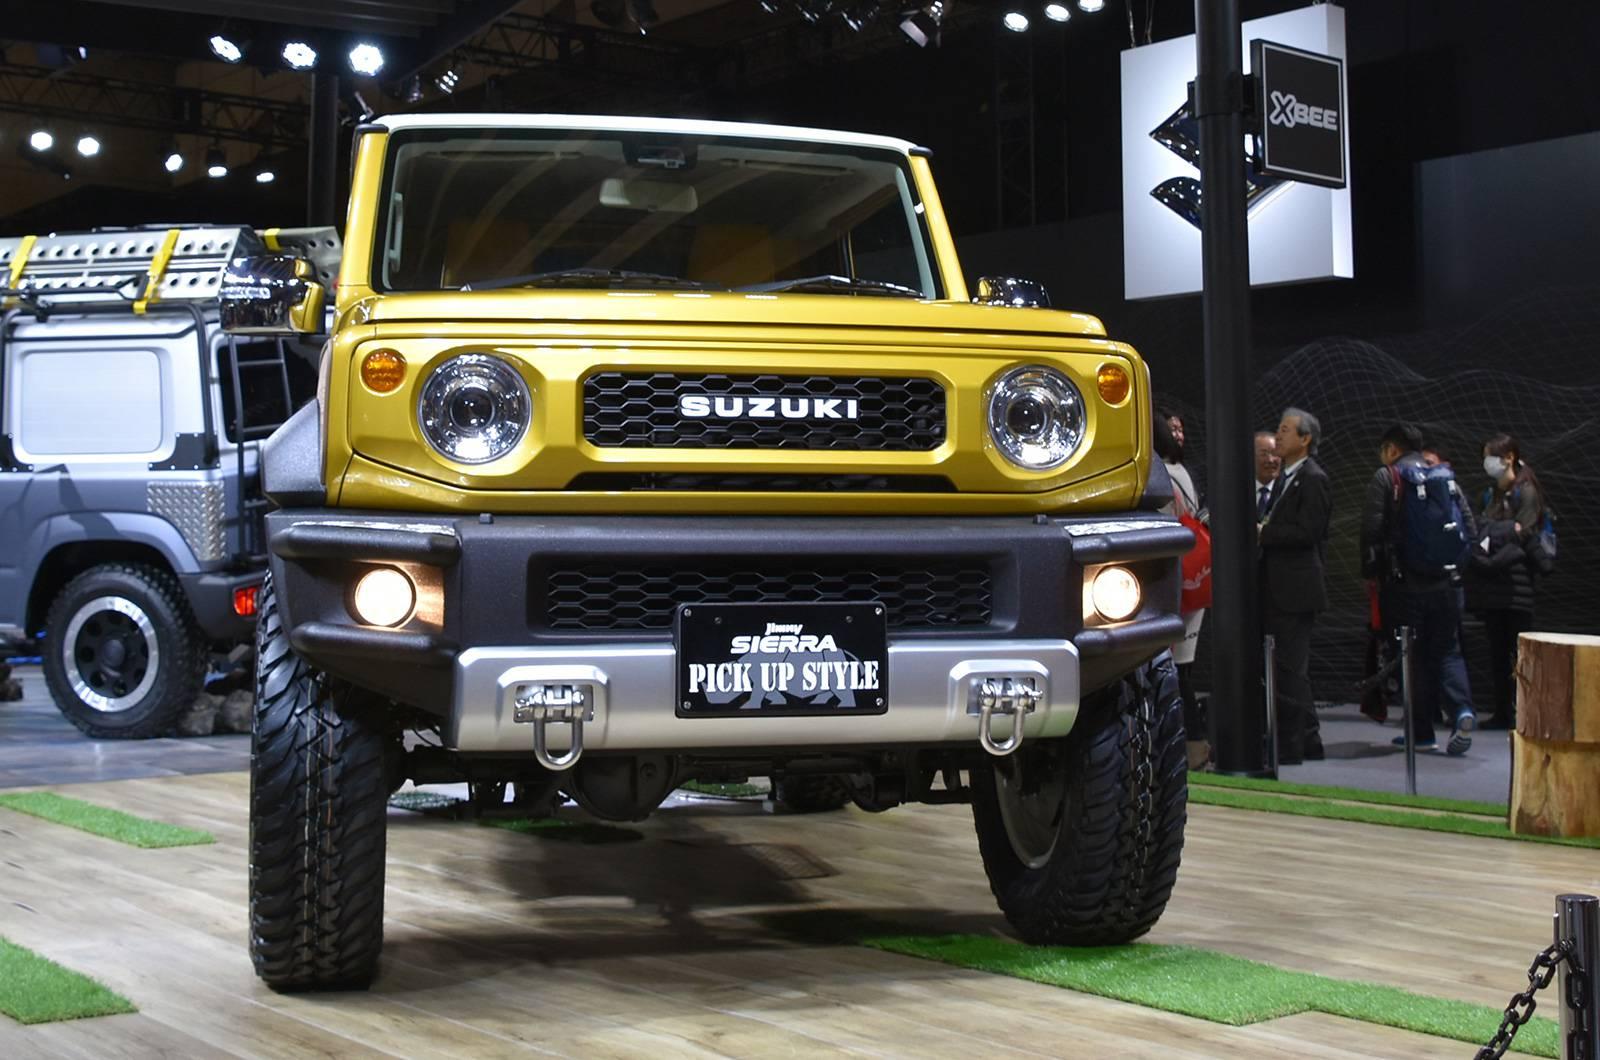 Suzuki Jimny Sierra Pickup Style concept andJimny Survive concept (1)